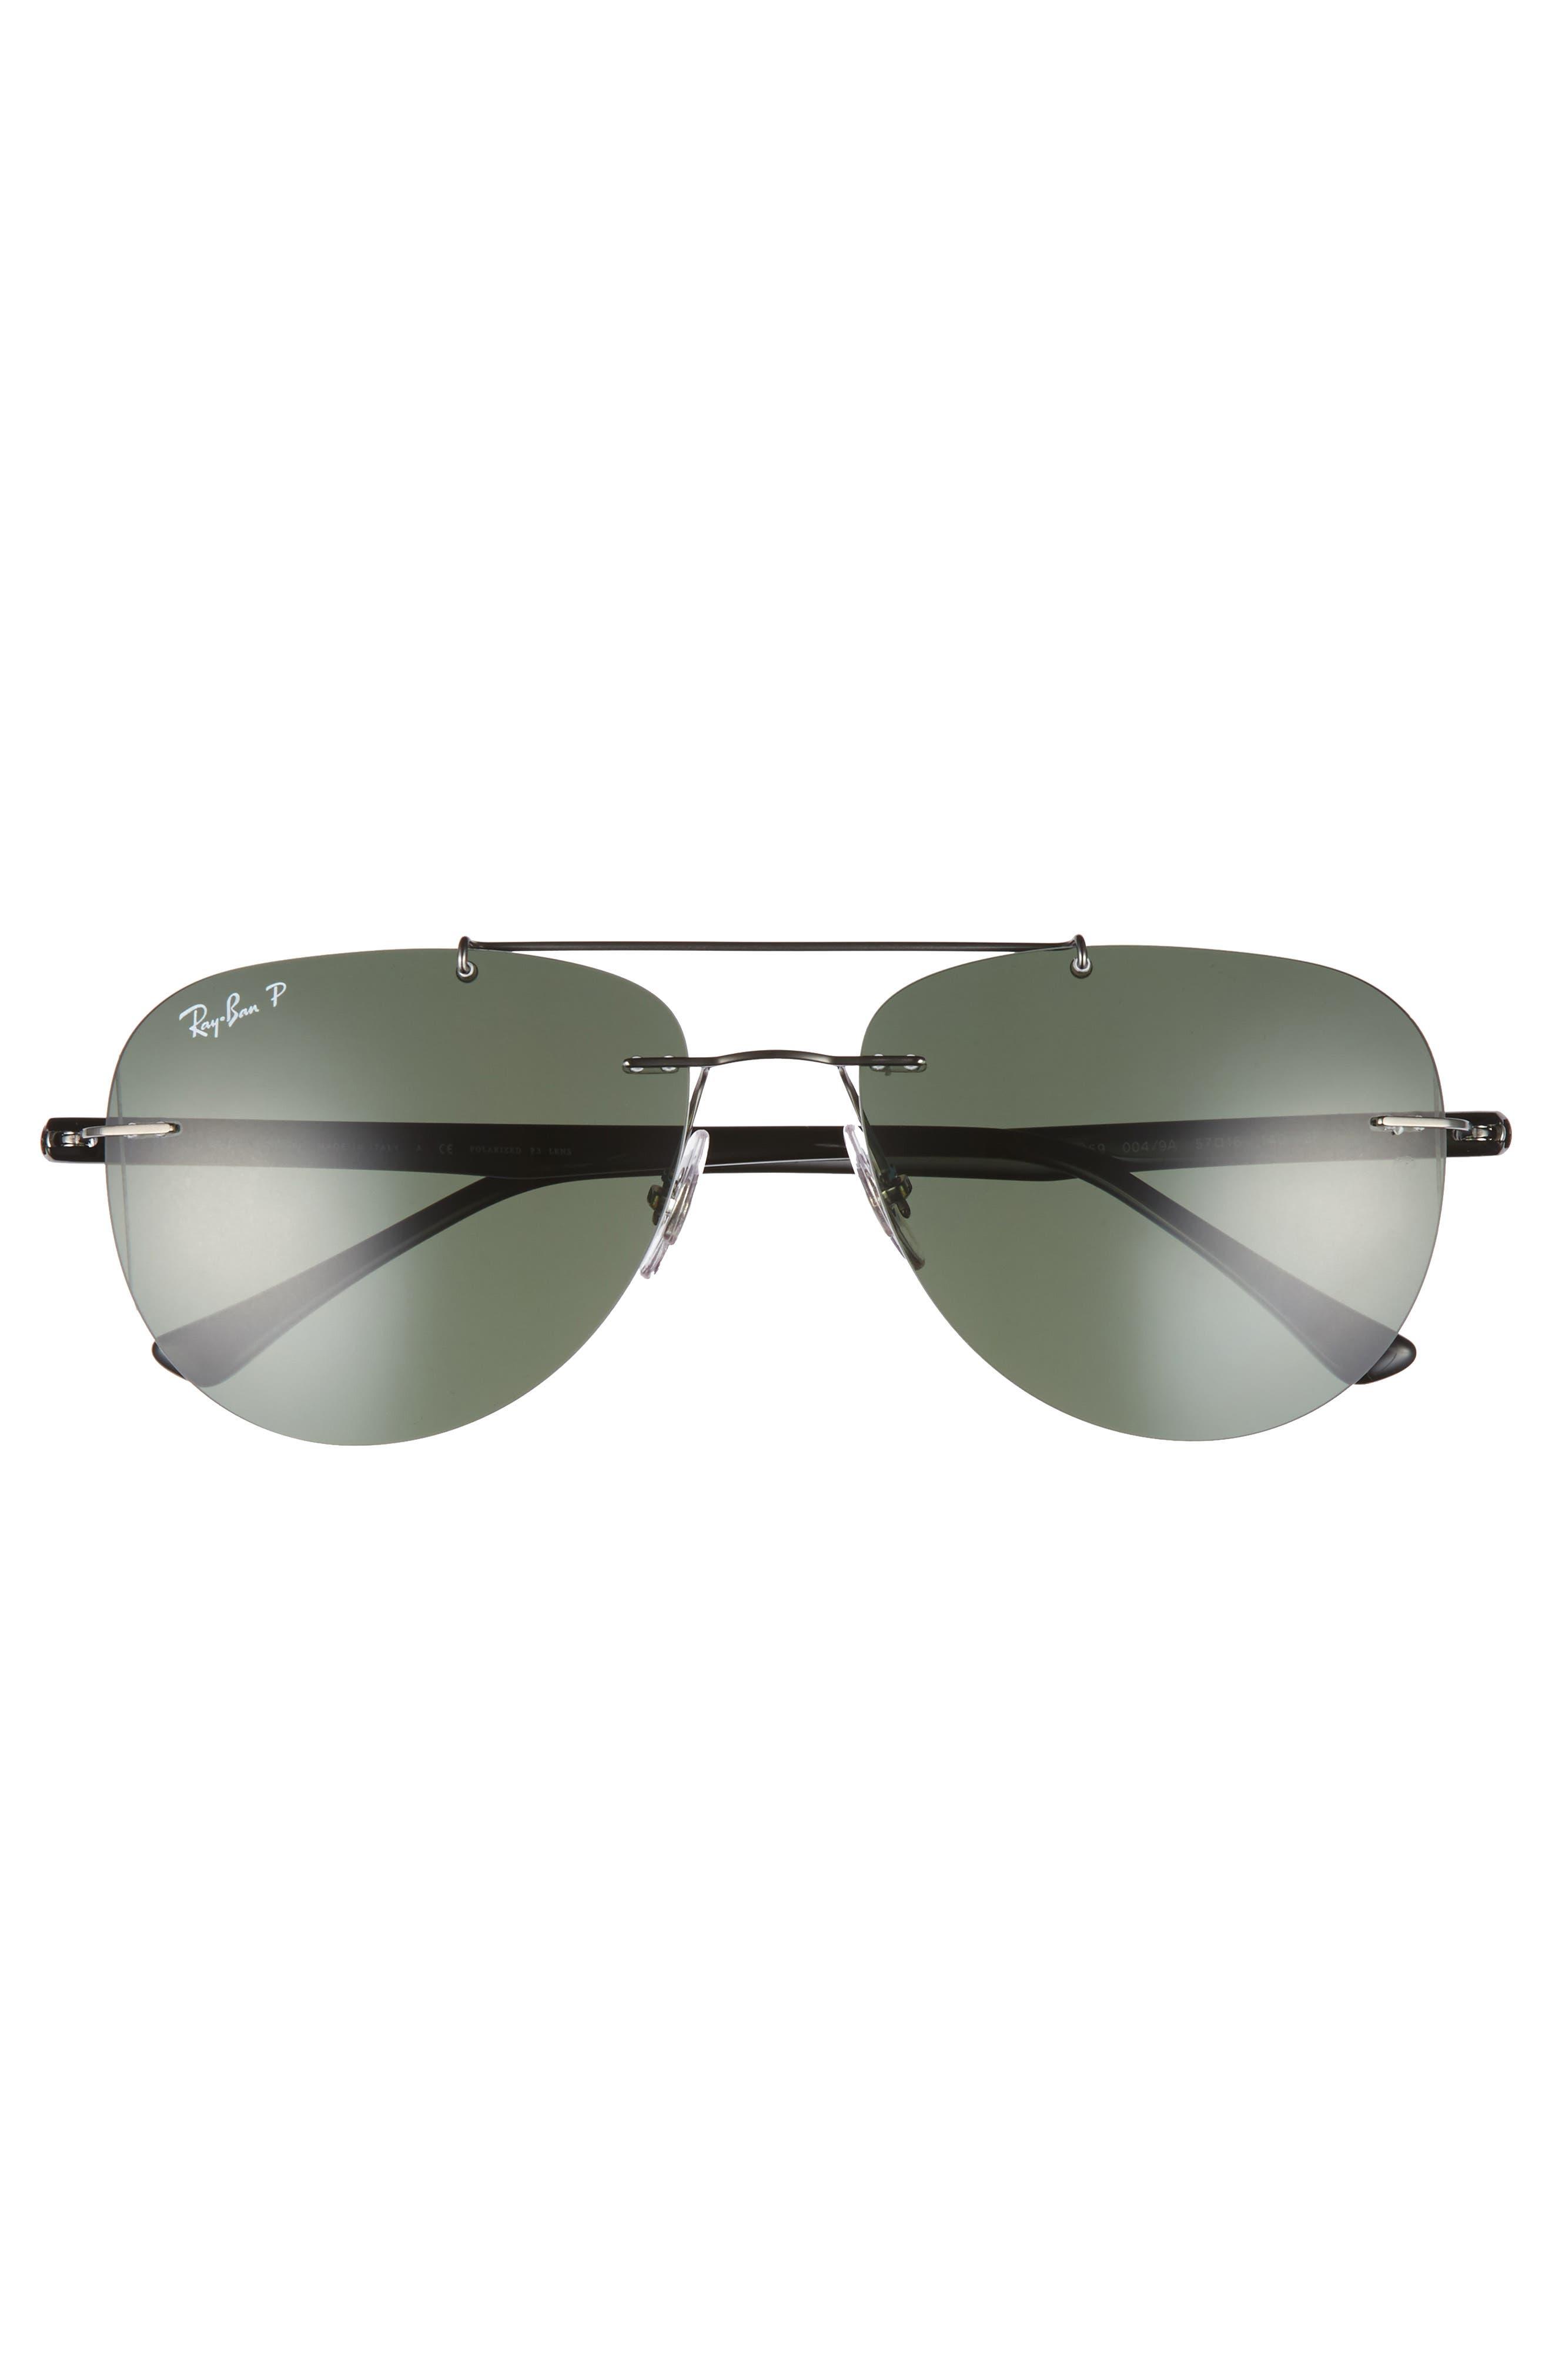 Phantos 57mm Polarized Rimless Aviator Sunglasses,                             Alternate thumbnail 2, color,                             Polar Gunmetal